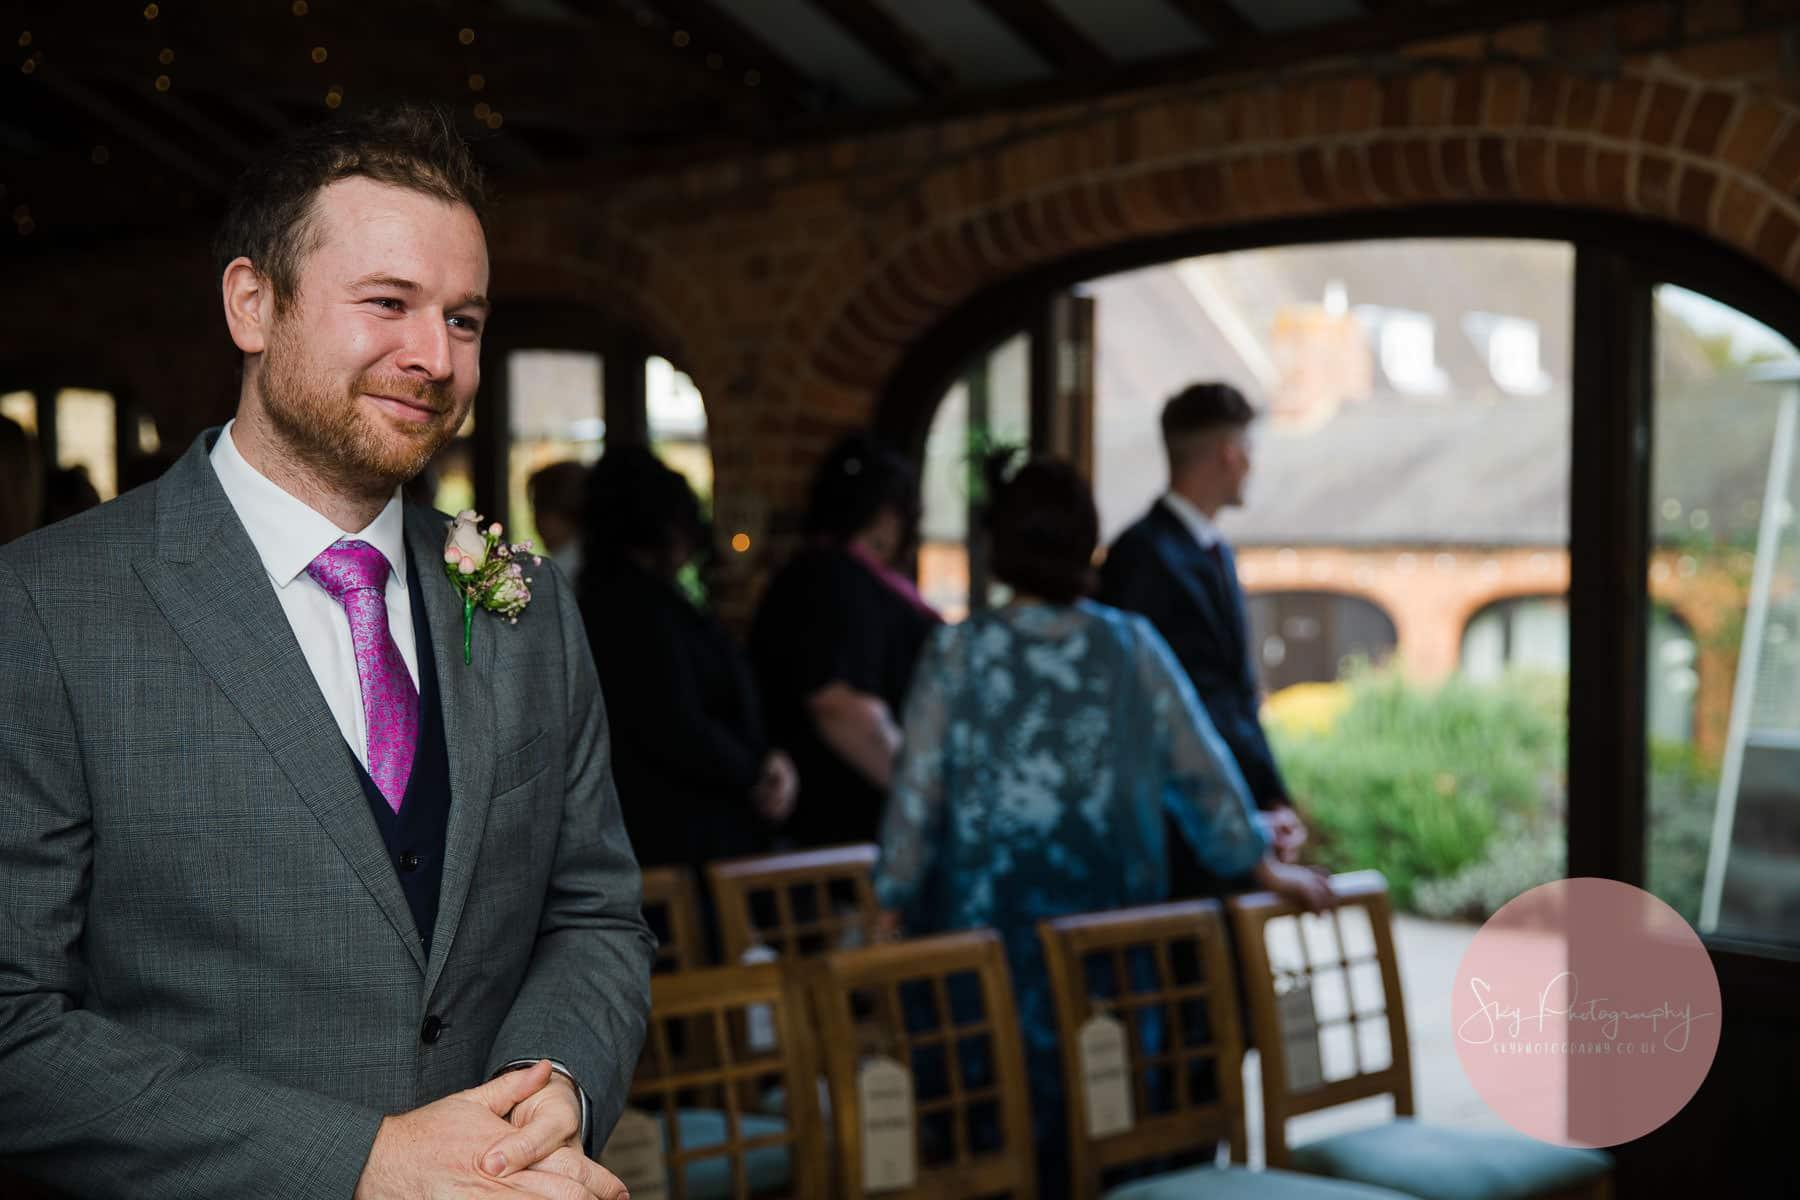 nervous and emotional groom awaits his brde